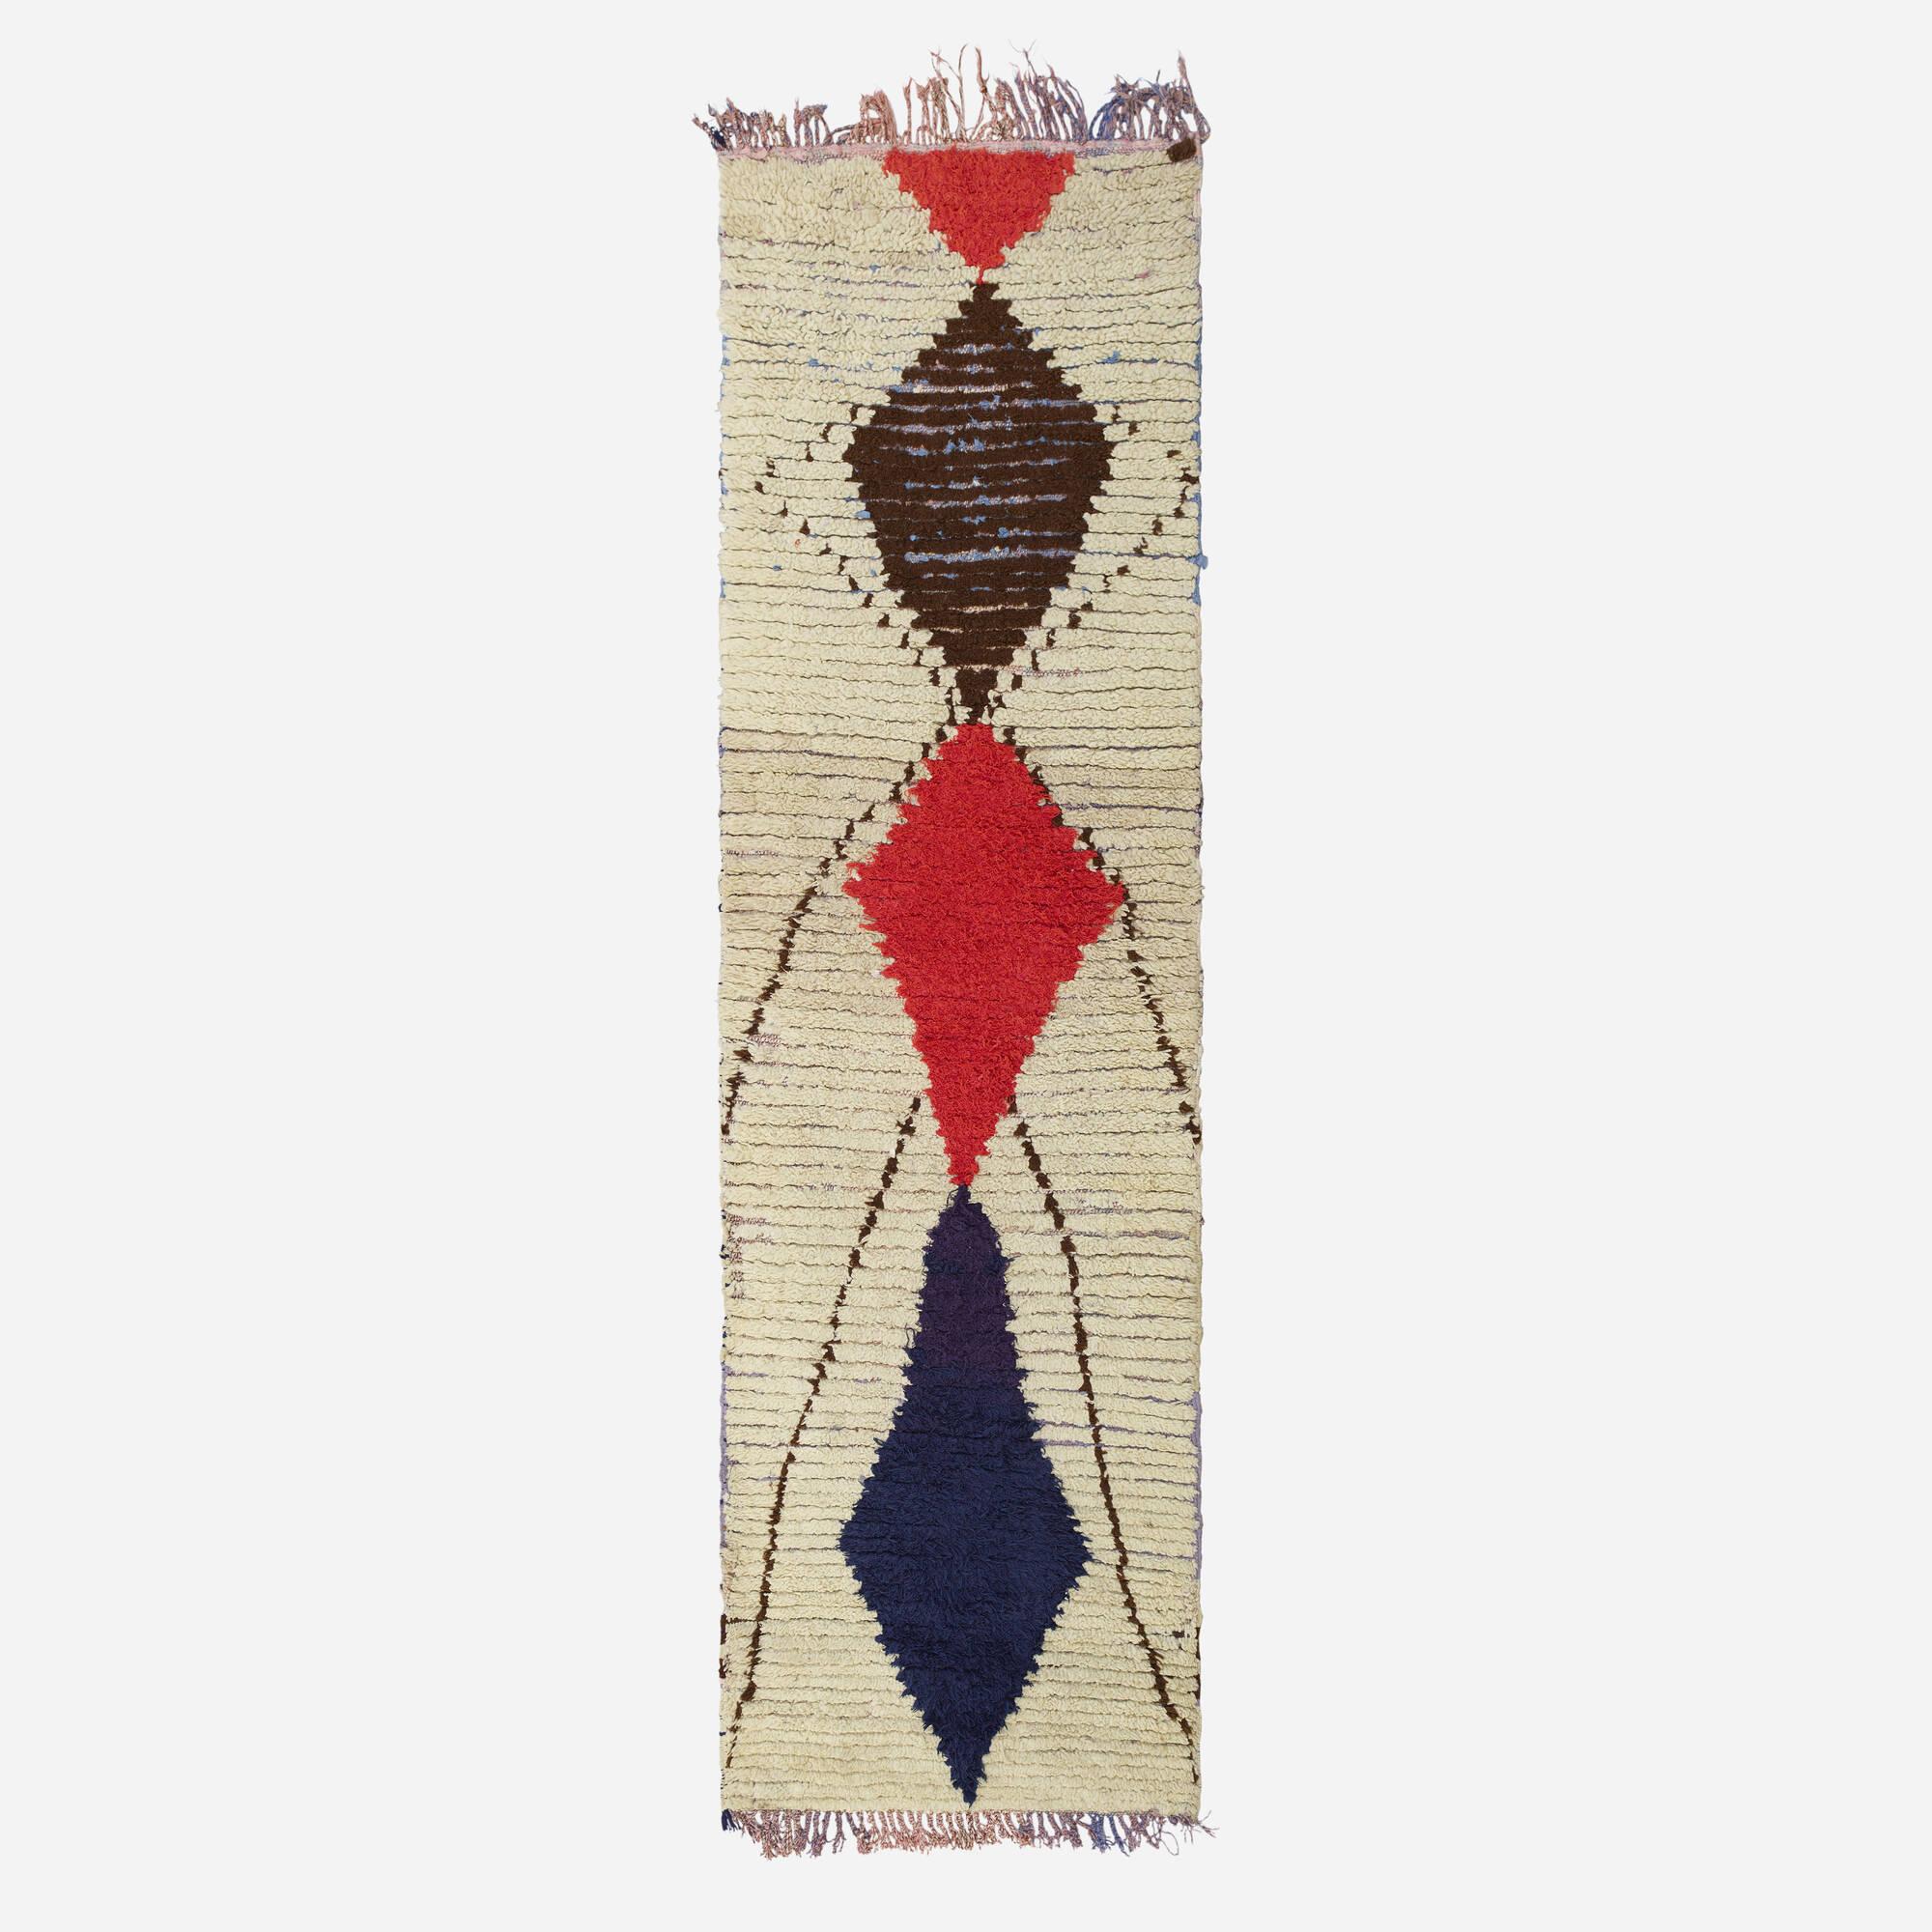 384: Moroccan / half-pile carpet (1 of 1)